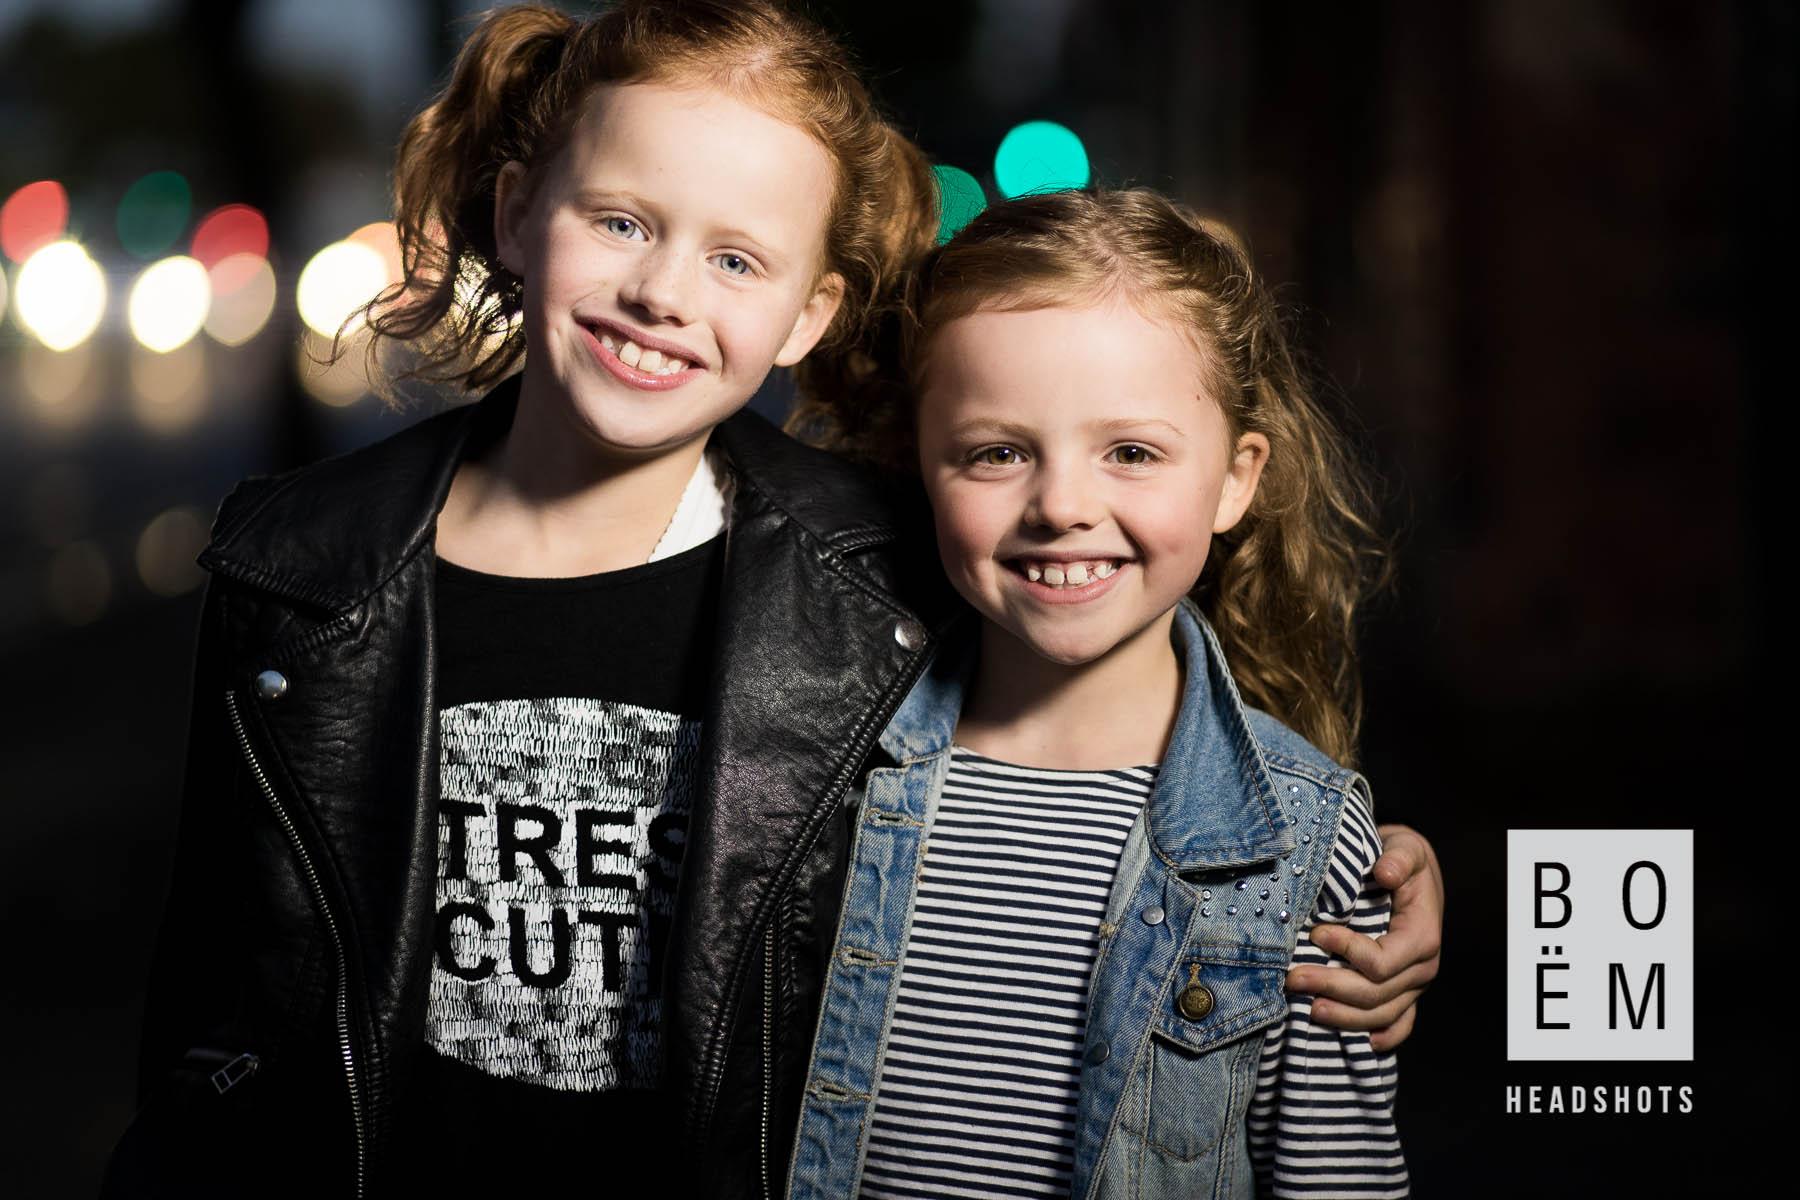 A Headshot session for two of theprettiest little girls I've ever seen here in Adelaide by Andre Goosen for Boem Headshots, The premier headshot photographer.